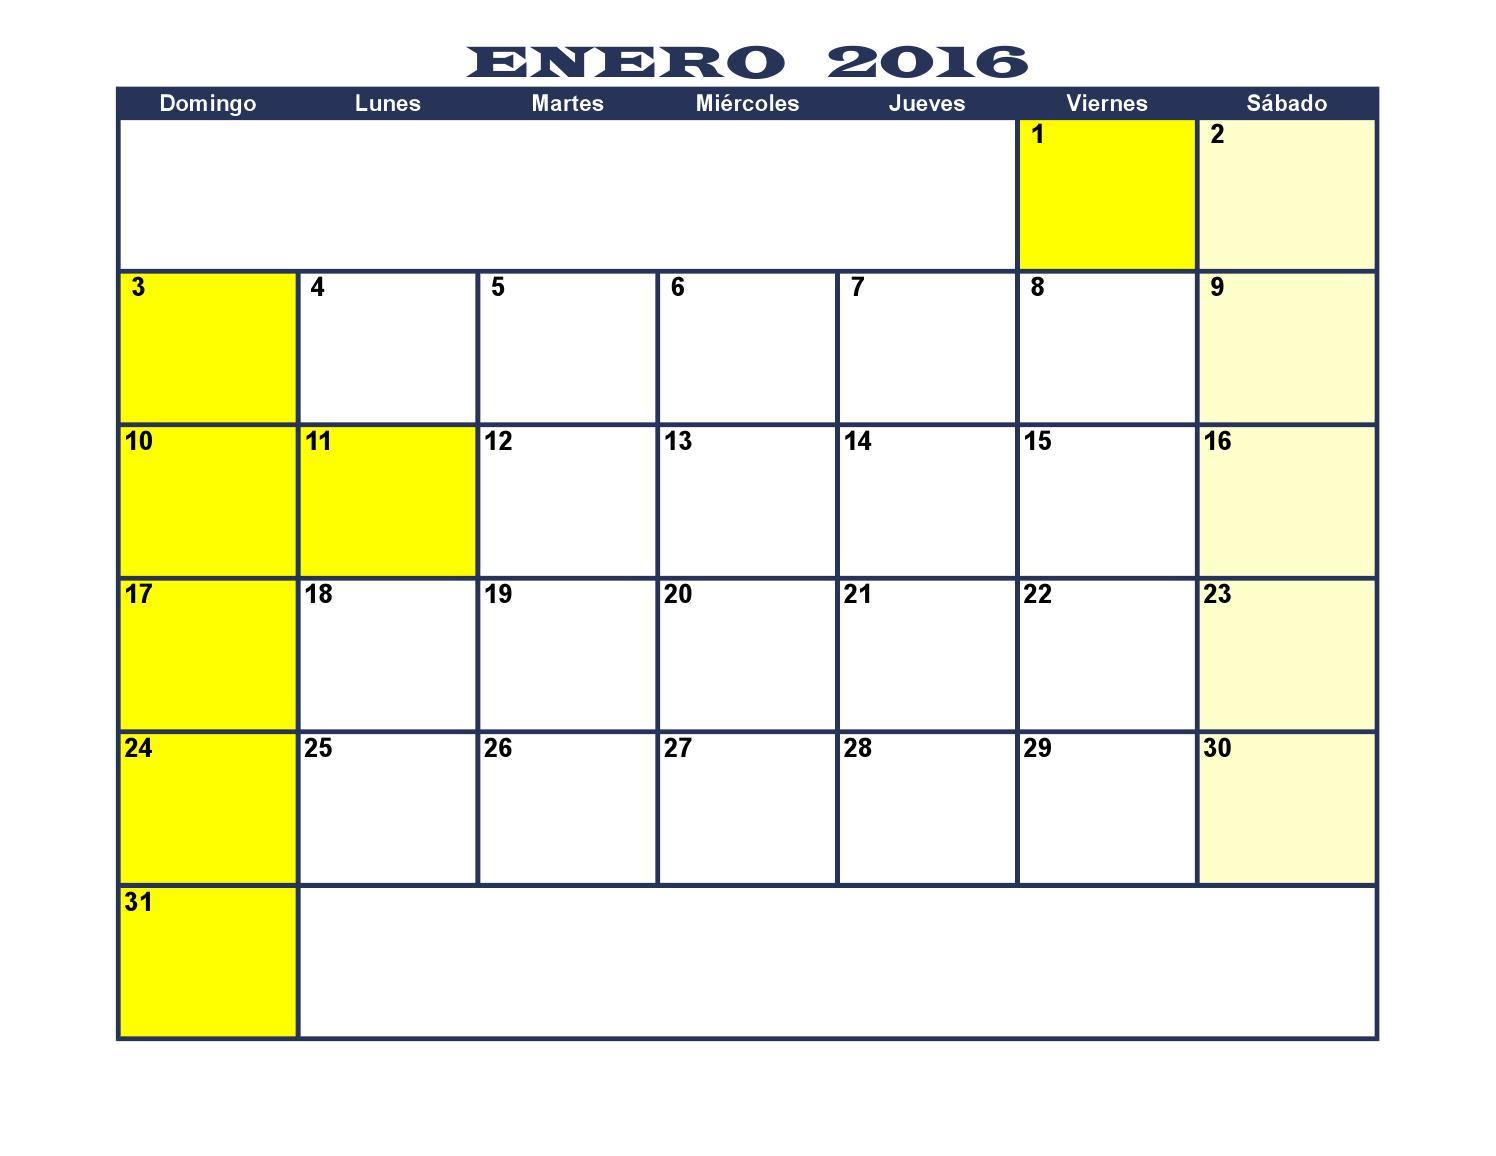 Calendario Colombiano.Calendario Colombia 2016 By Luis Guillermo Restrepo Rivas